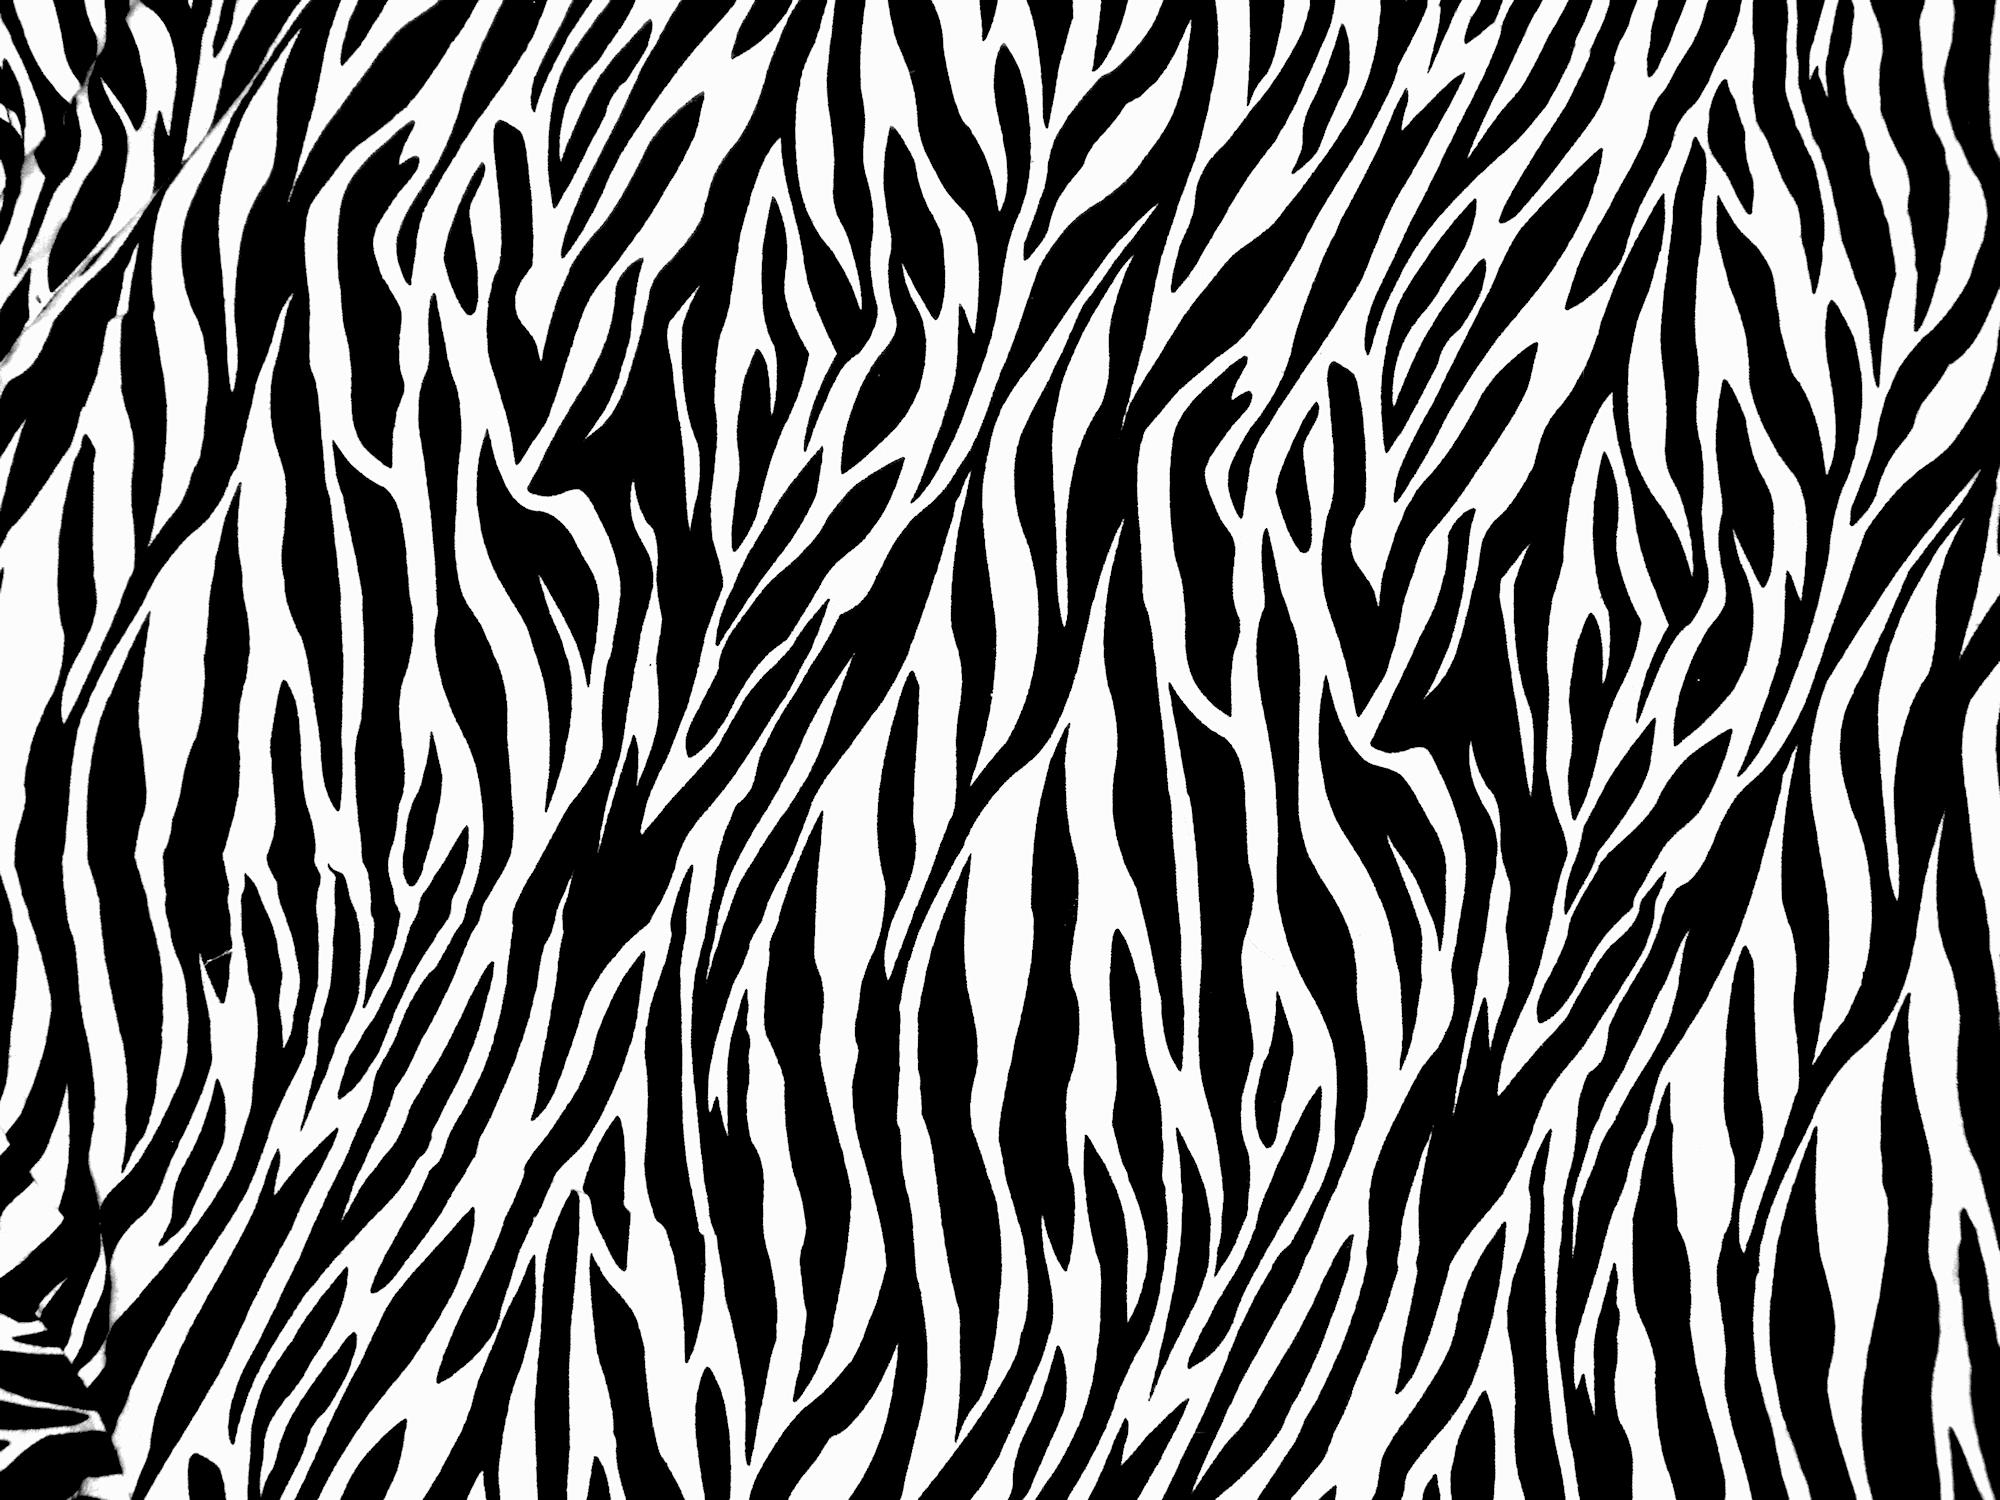 Zebra Print PNG